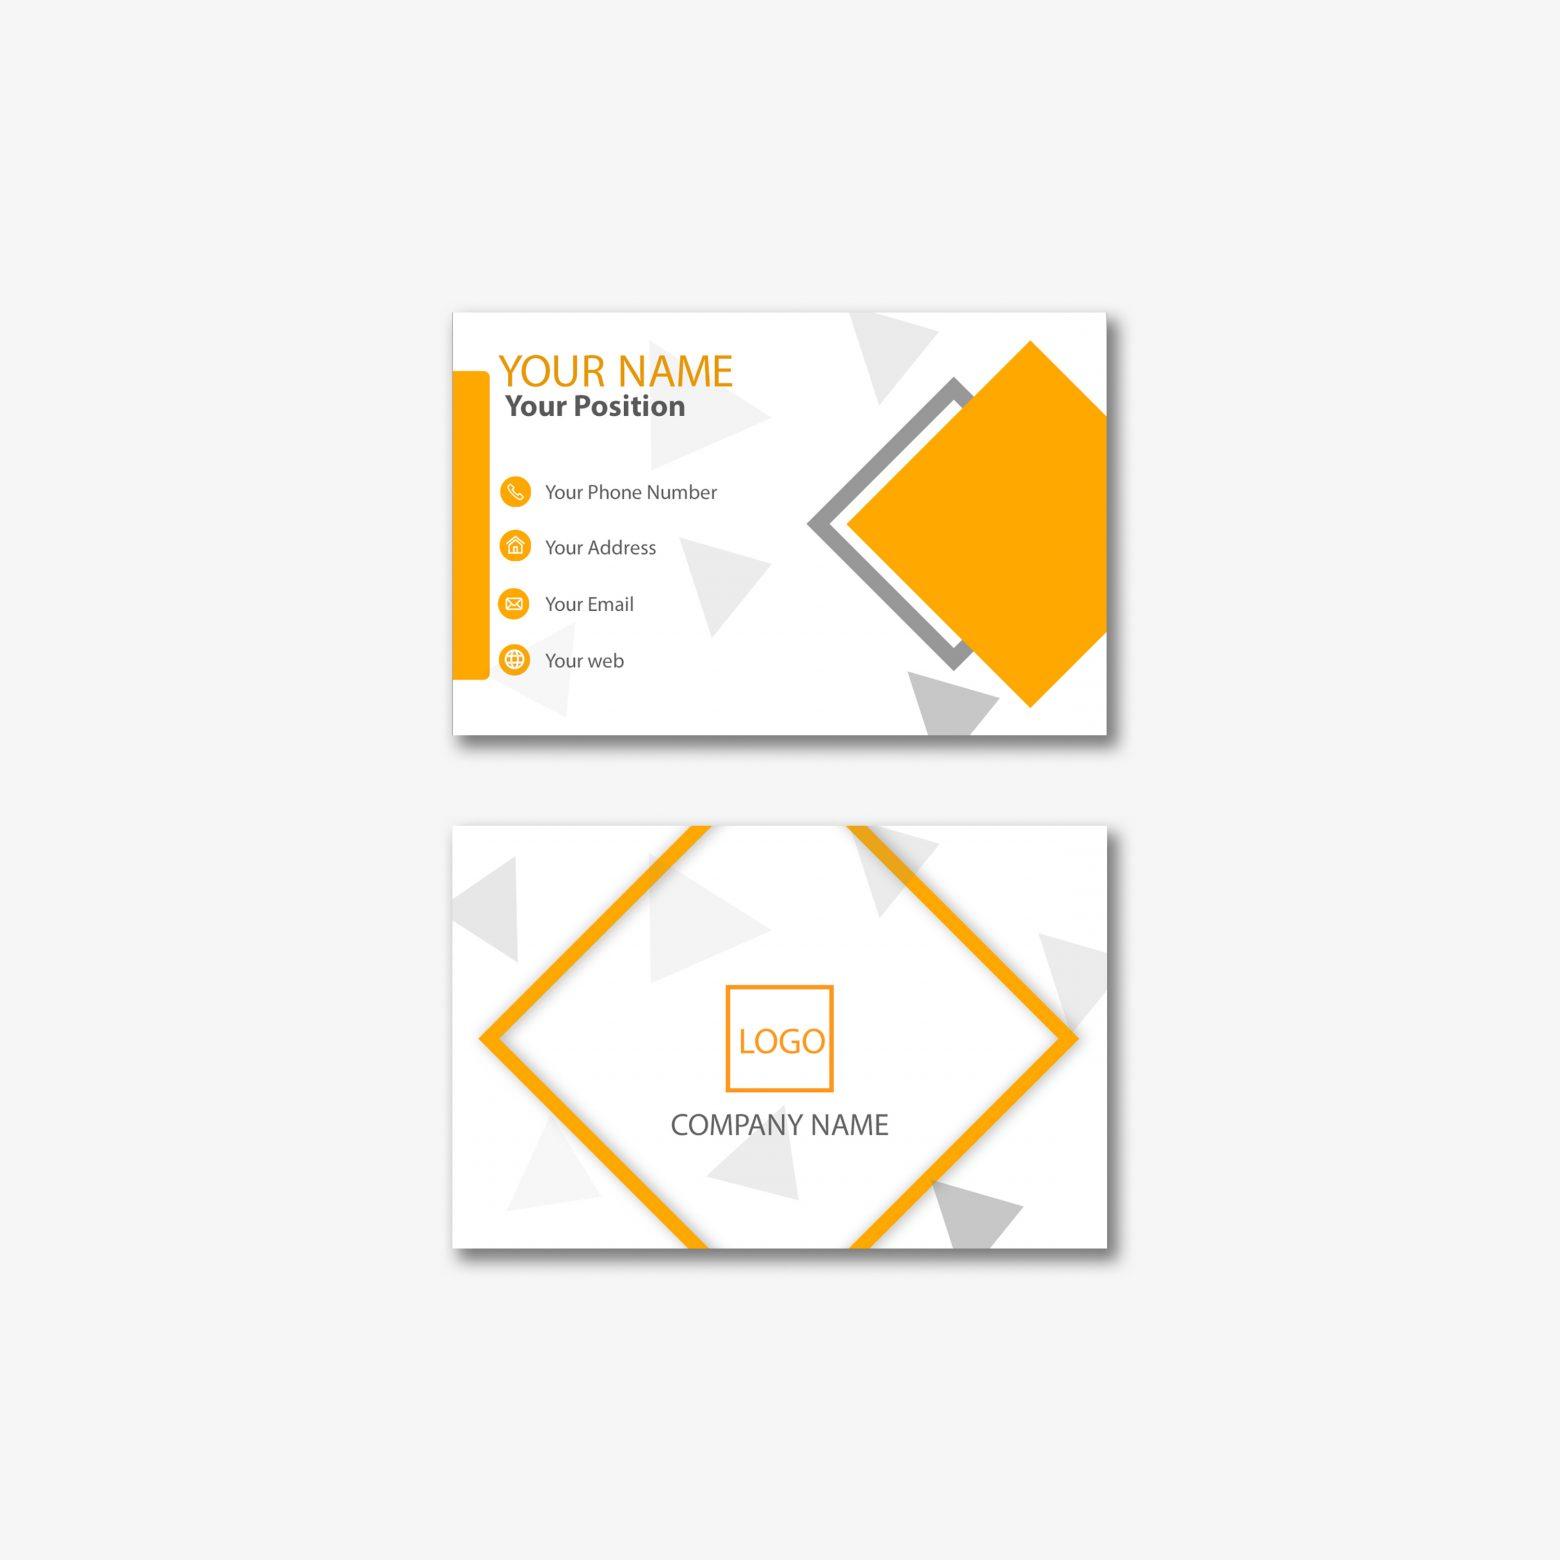 3031331 1560x1560 - کارت ویزیت شرکتی لایه باز